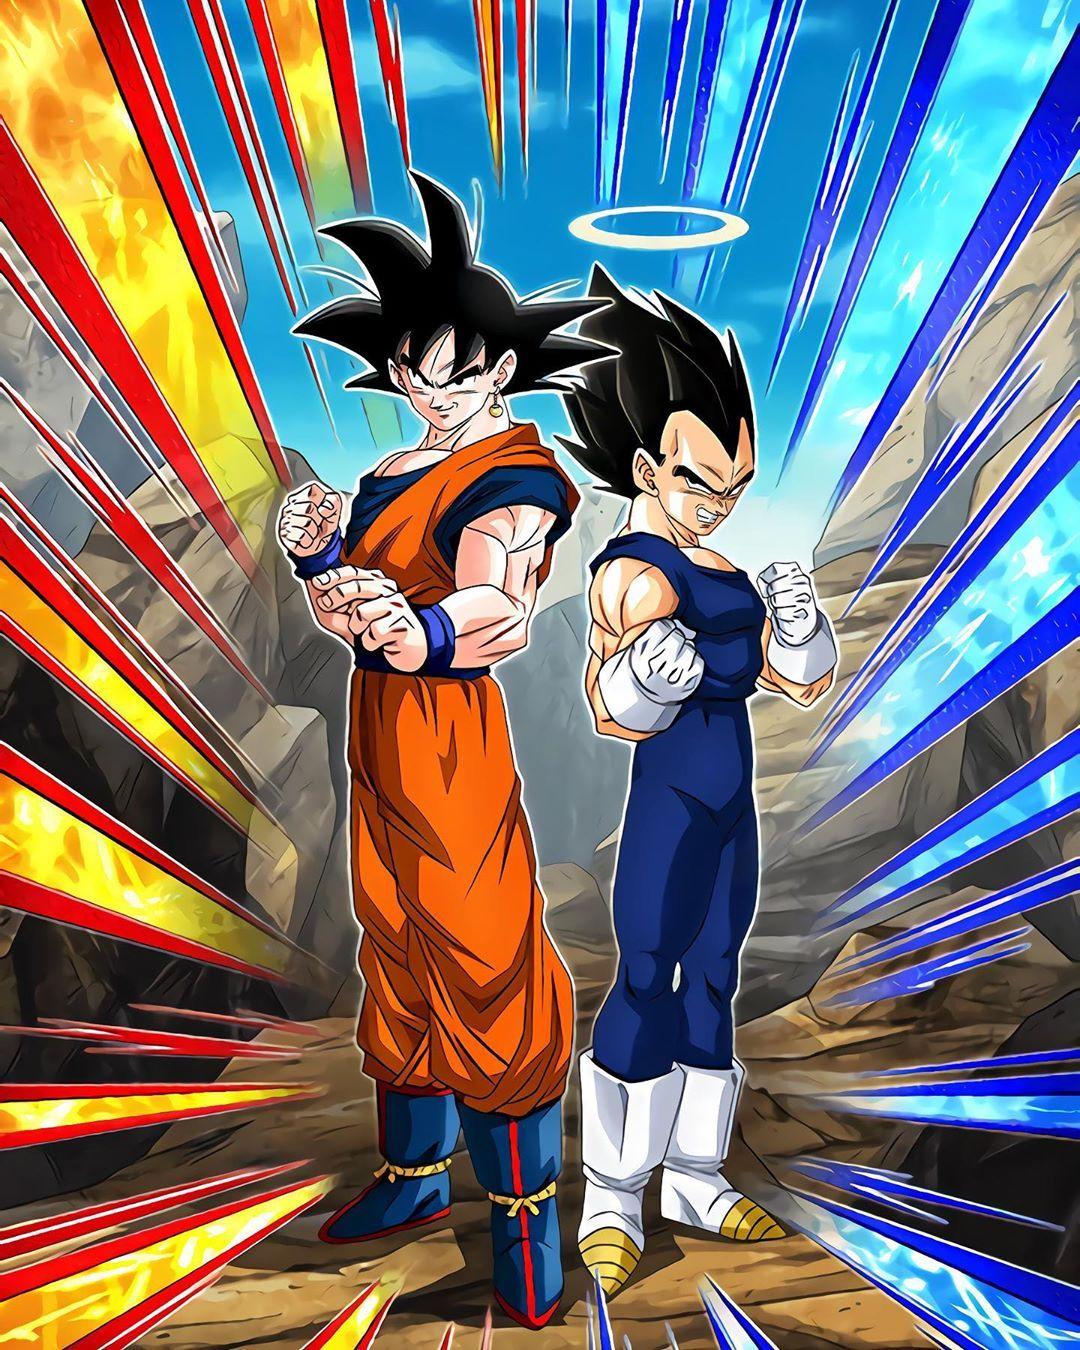 Majindokkan40 On Instagram Hd Art Of Goku Vegeta And Buu Majindokkan40 Anime Dragon Ball Super Dragon Ball Super Manga Dragon Ball Artwork